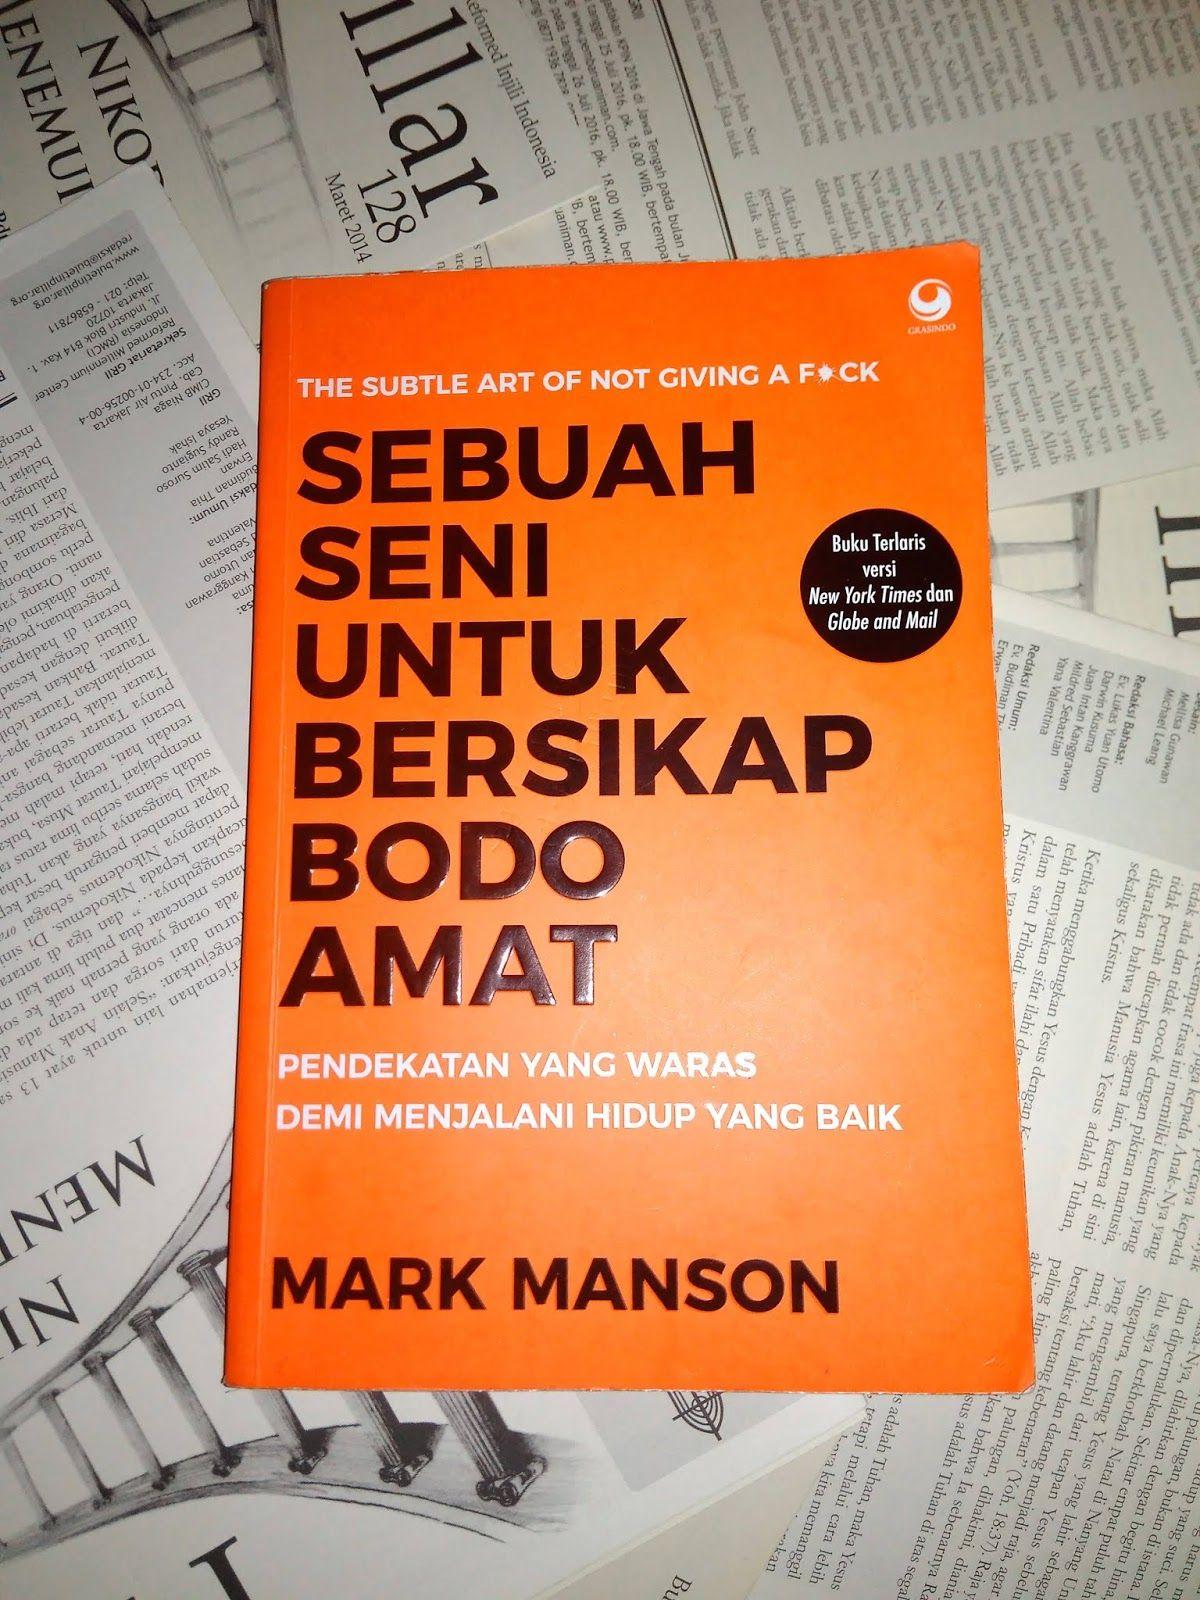 Sebuah Seni Untuk Bersikap Bodo Amat Oleh Mark Manson Sebuah Perenungan Ningspara Good Night Quotes Kutipan Buku Kata Kata Motivasi